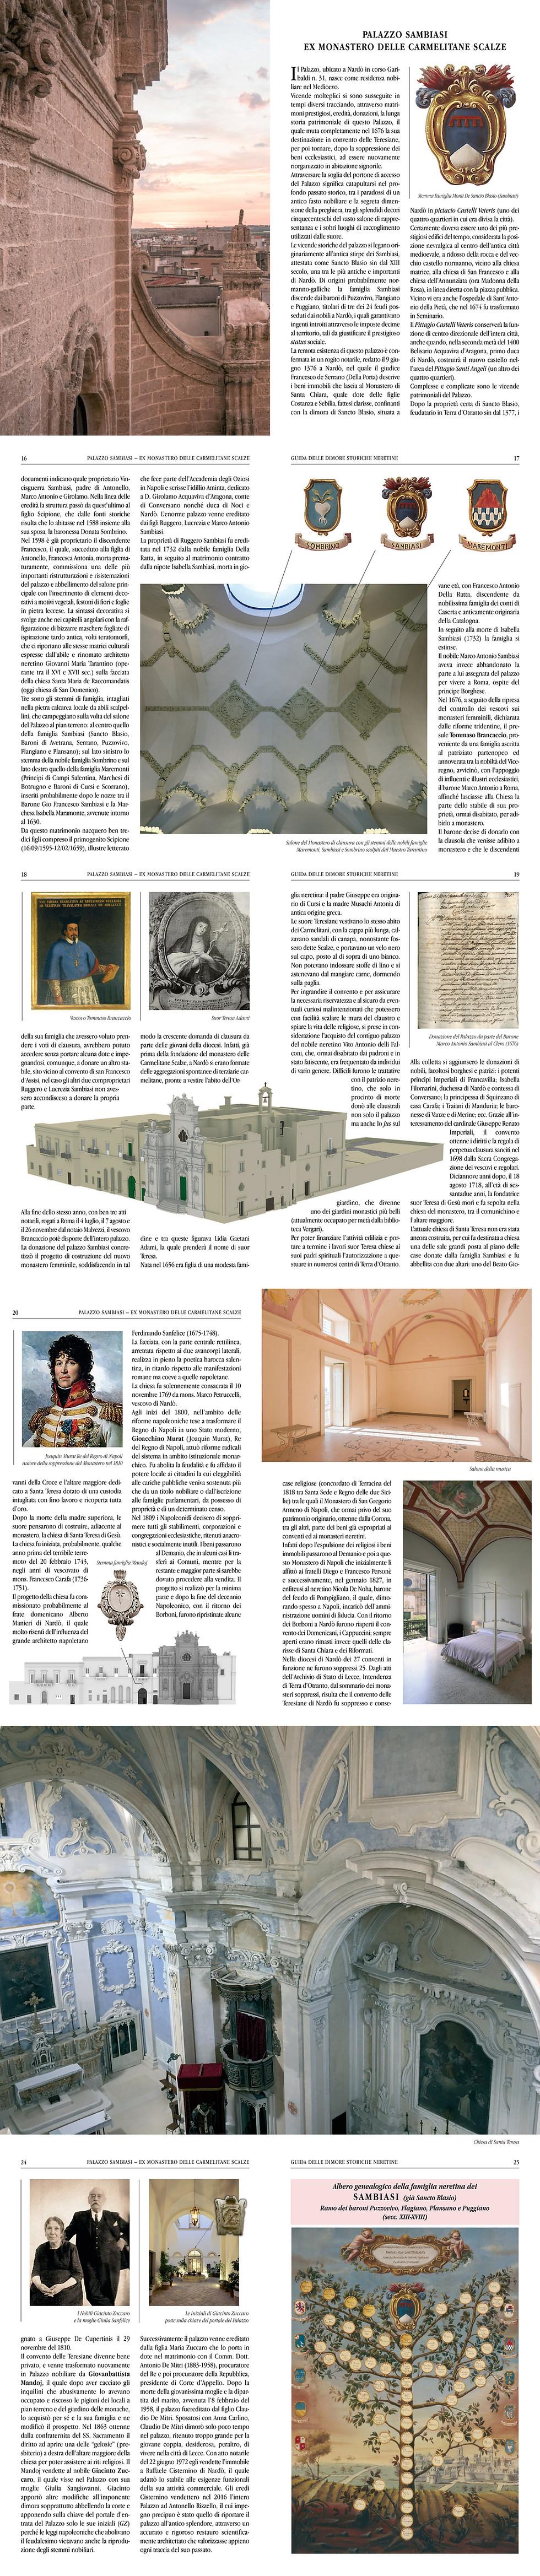 Storia del Monastero SantaTeresa